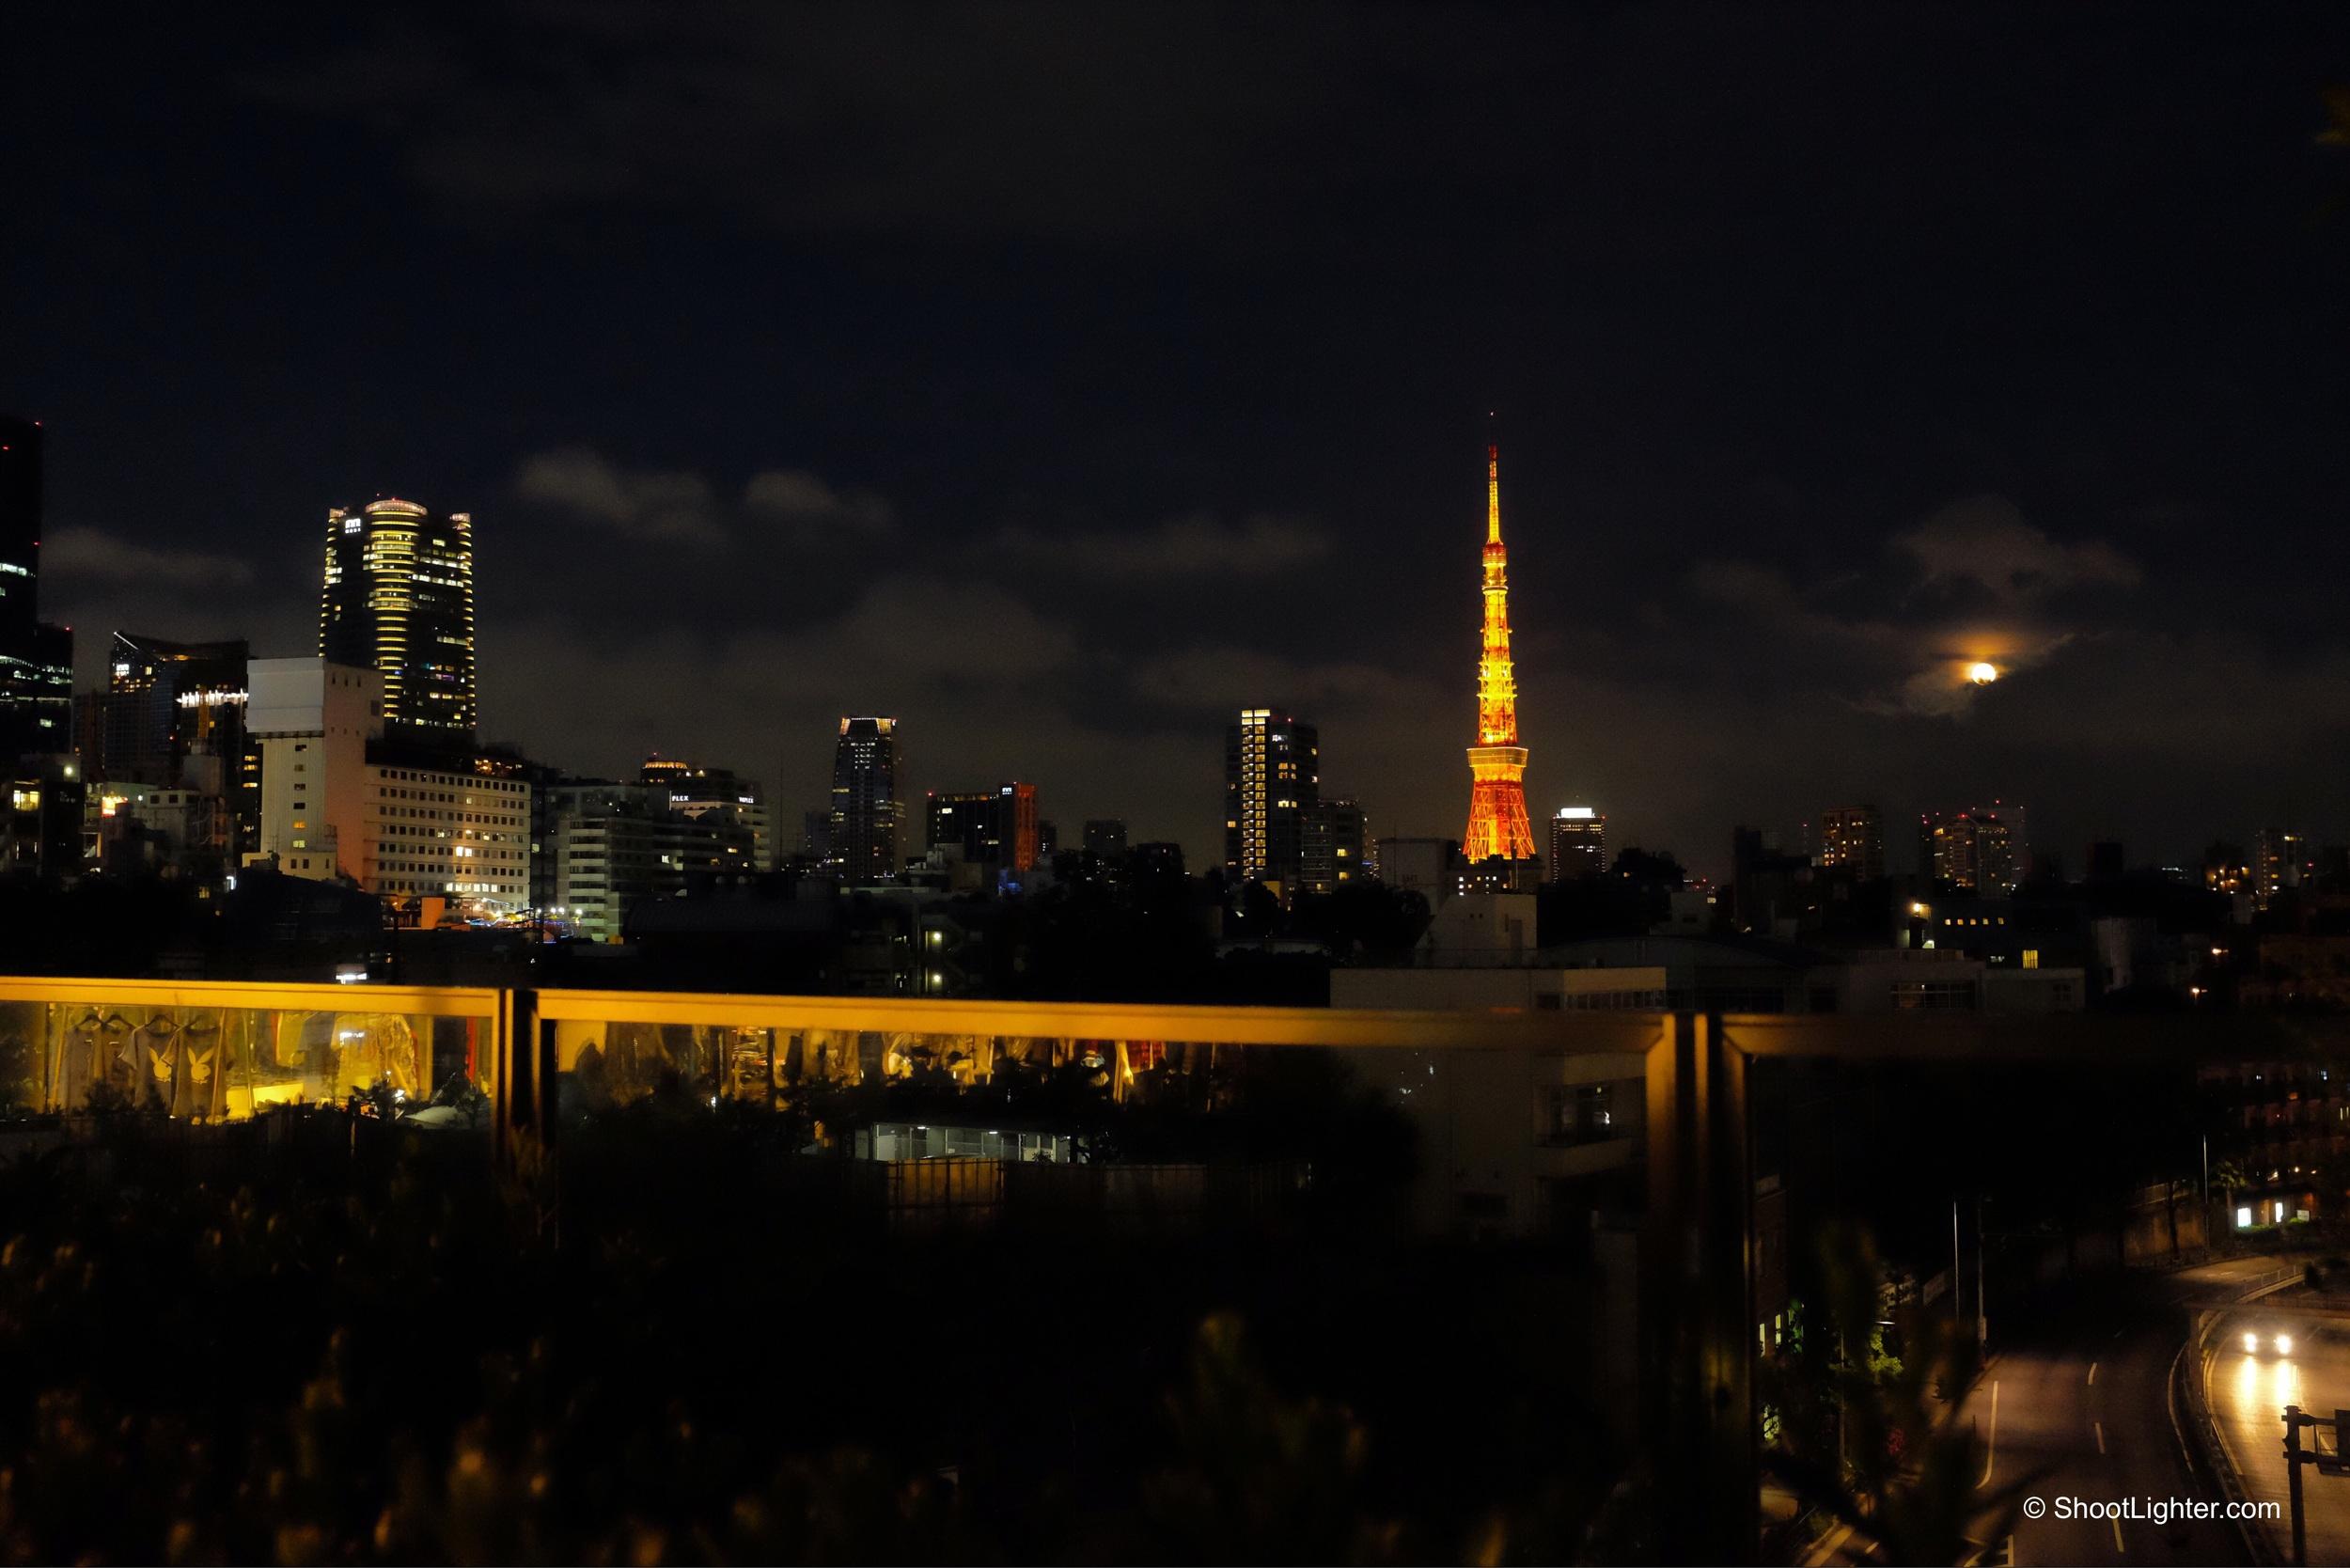 Roppongi, Tokyo -Fuji x100T, ISO 2500, f/4, 1/60 sec. No edit. Straight out of camera.